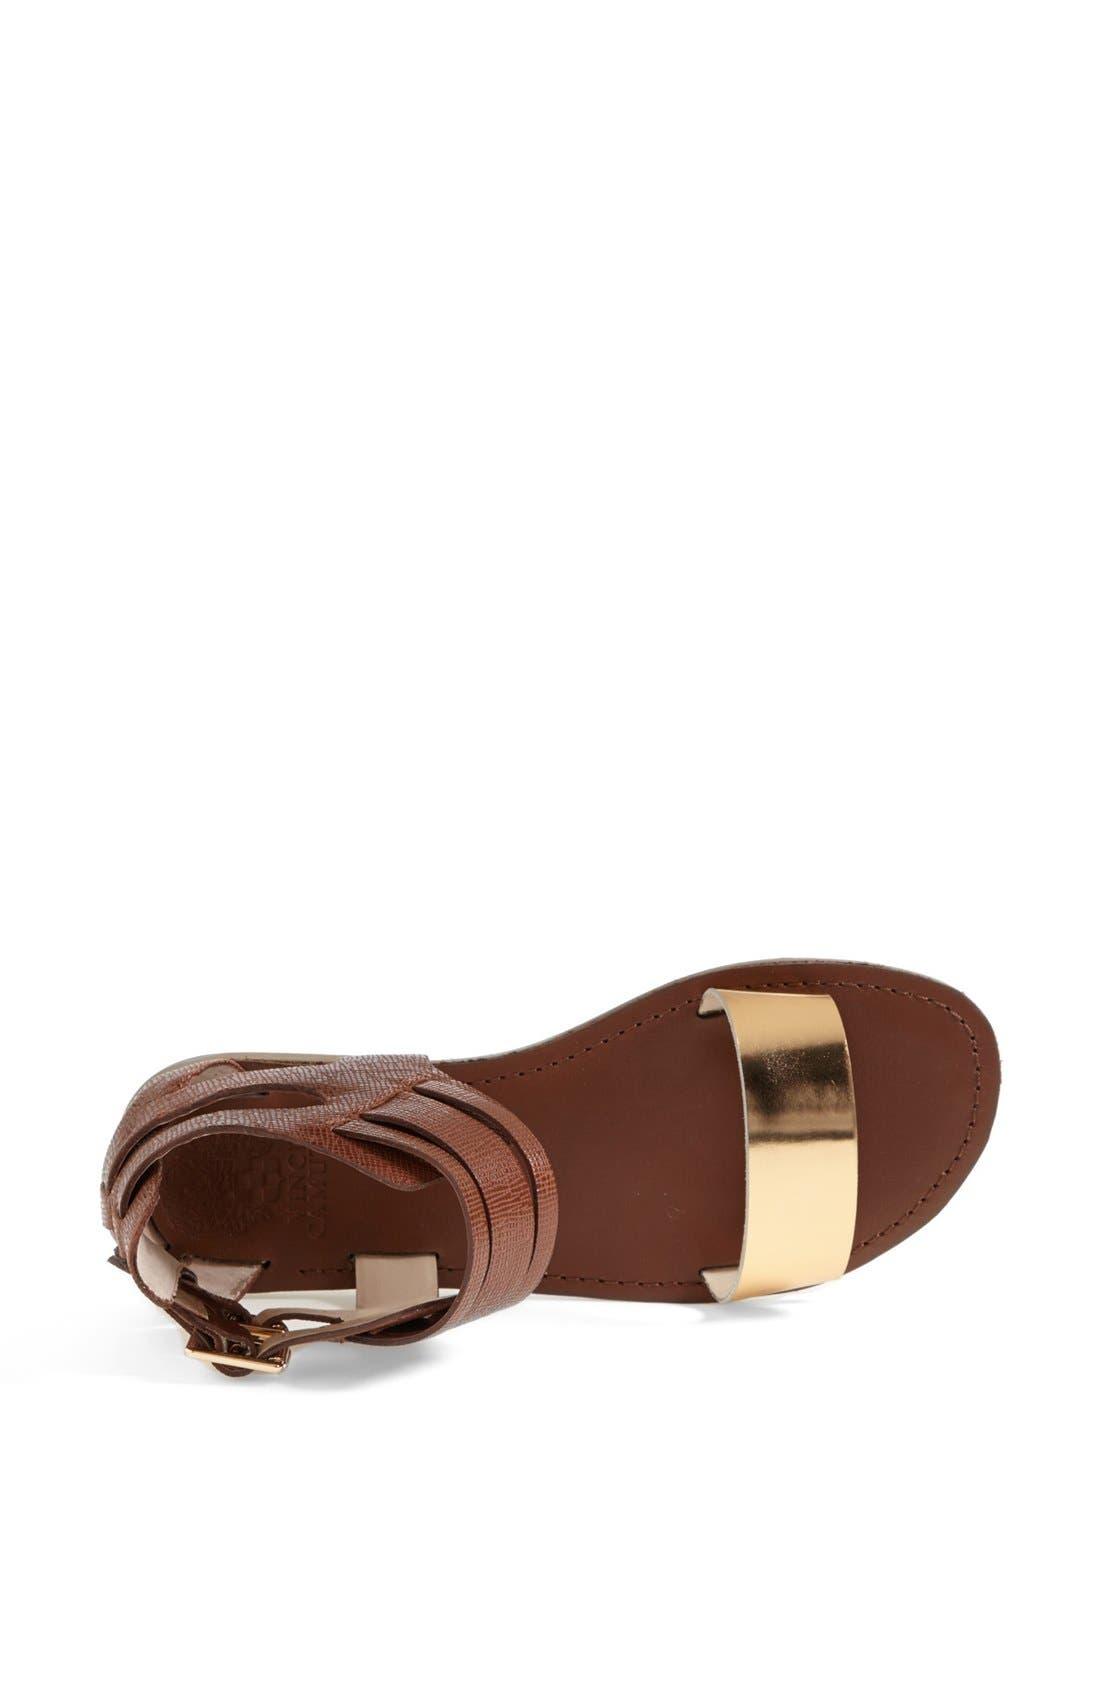 Alternate Image 3  - Vince Camuto 'Irkeno' Leather Sandal